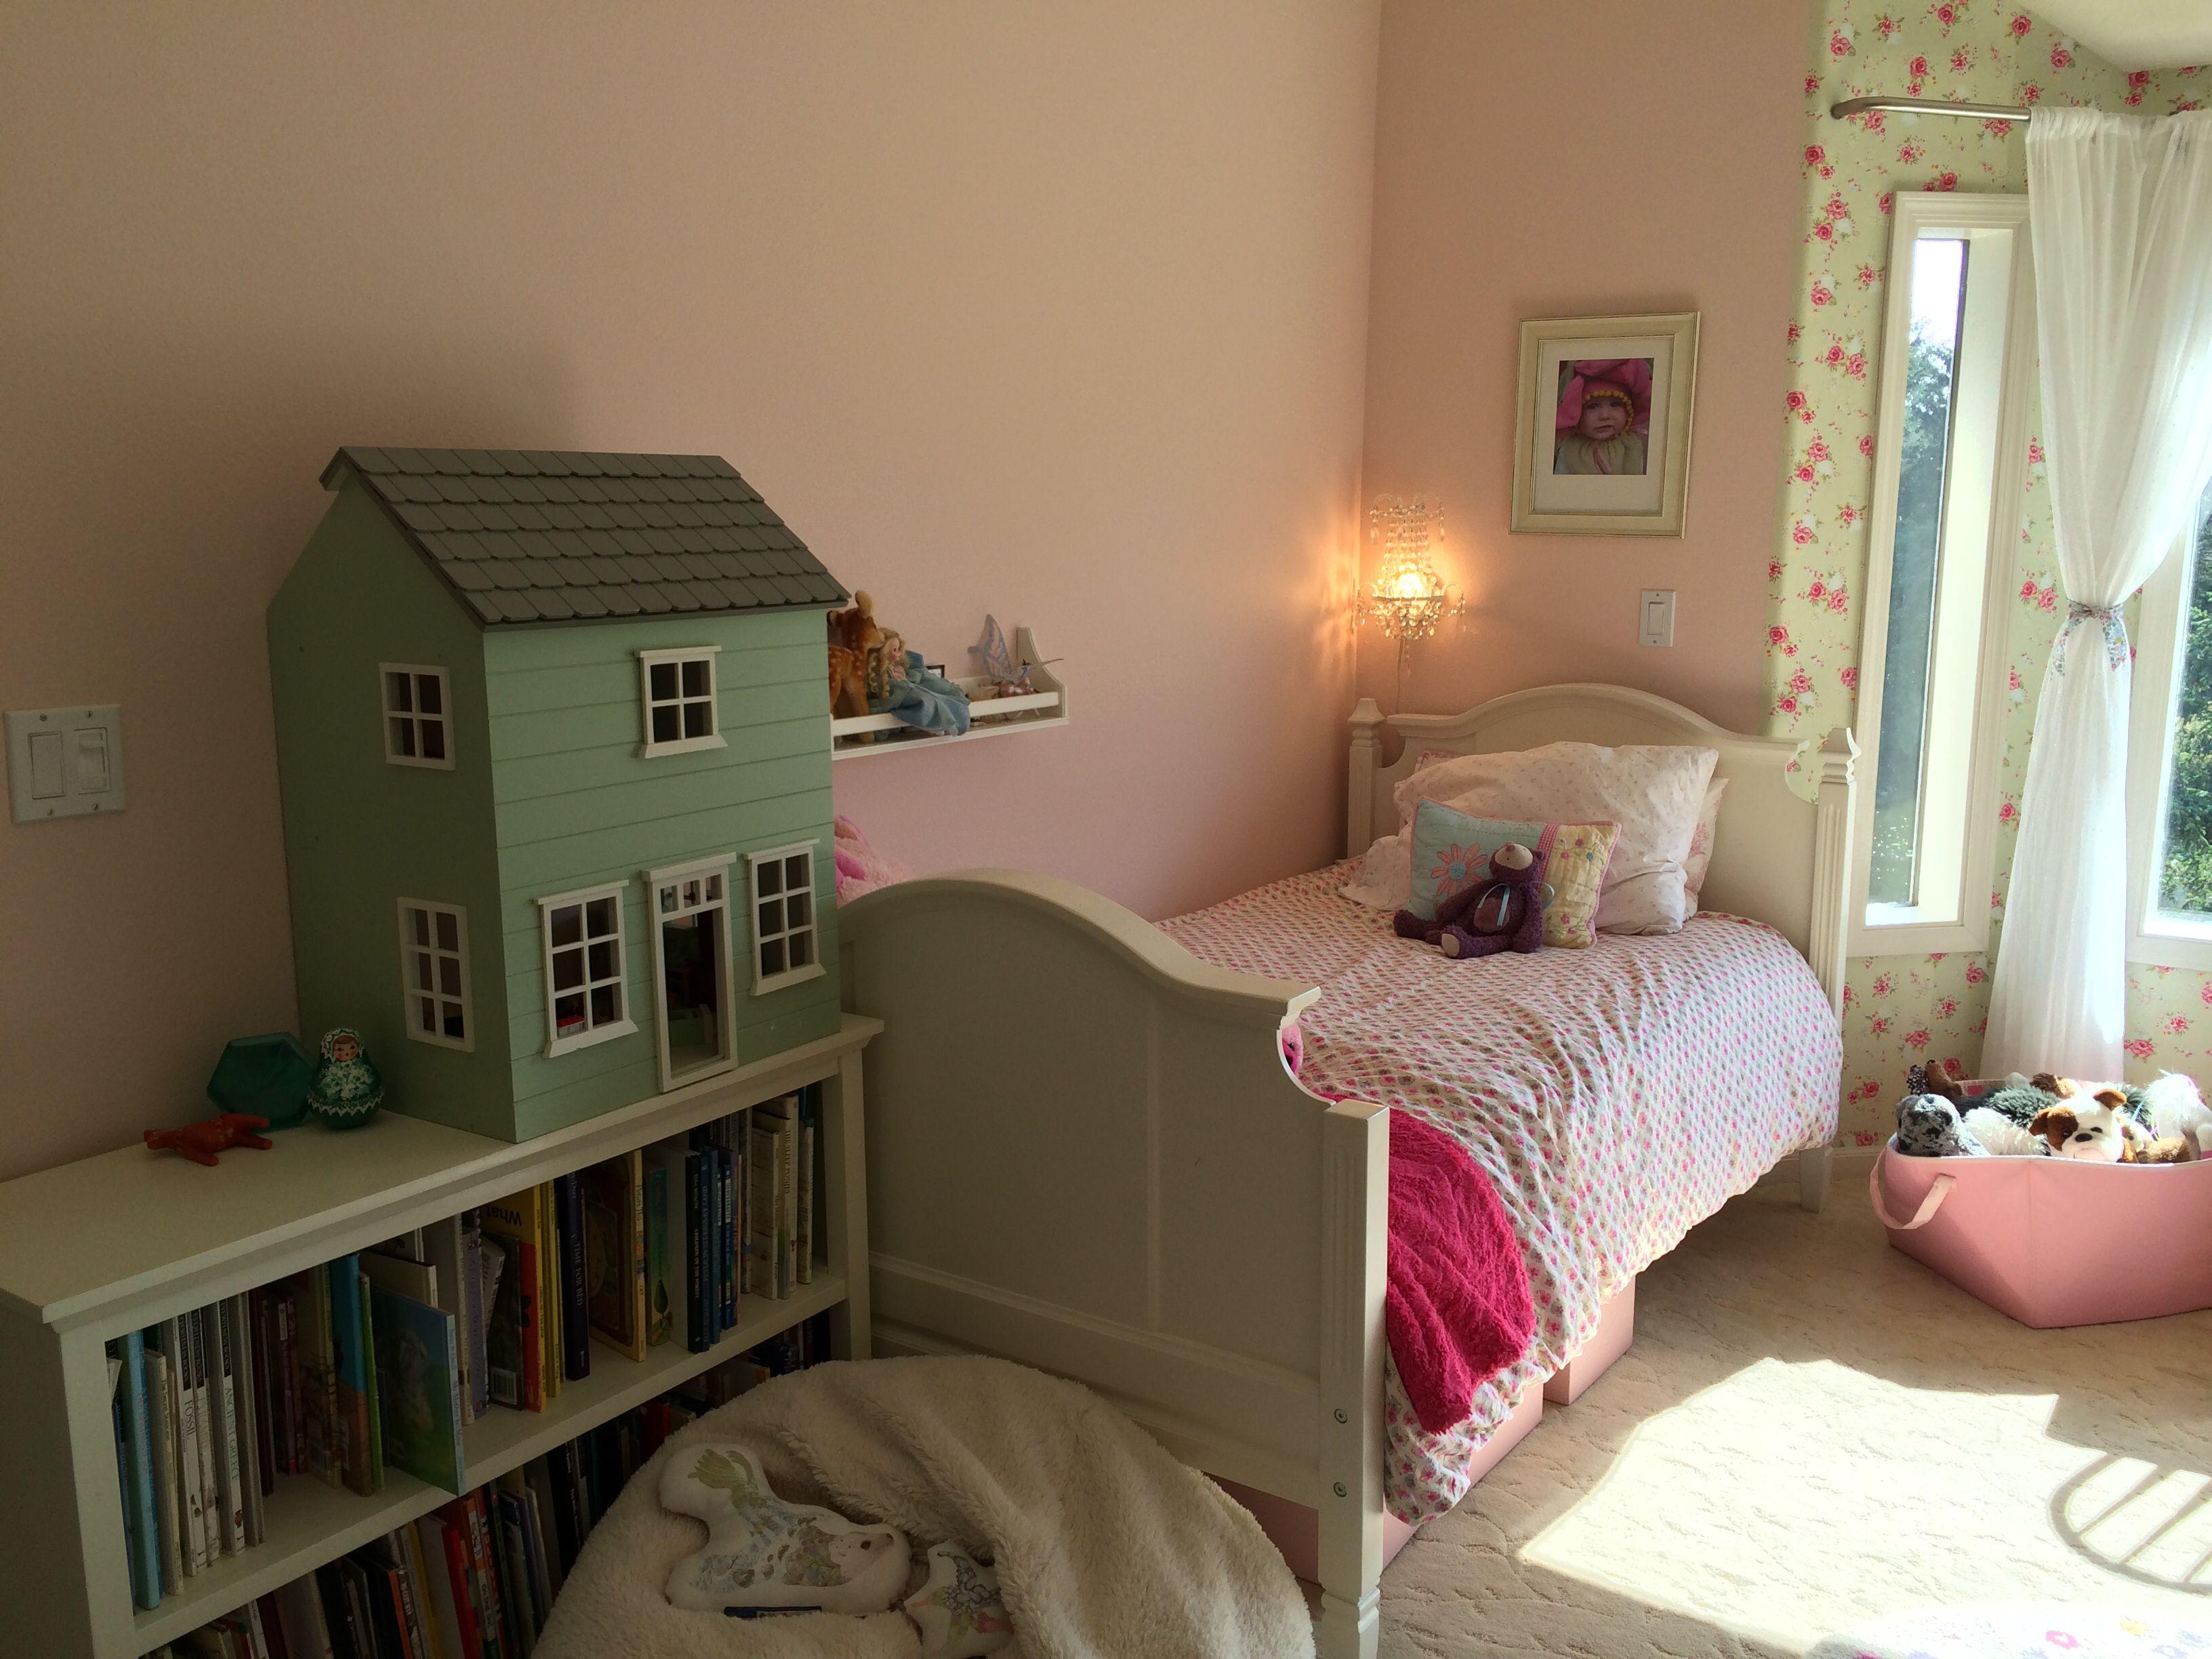 Olivia's bed